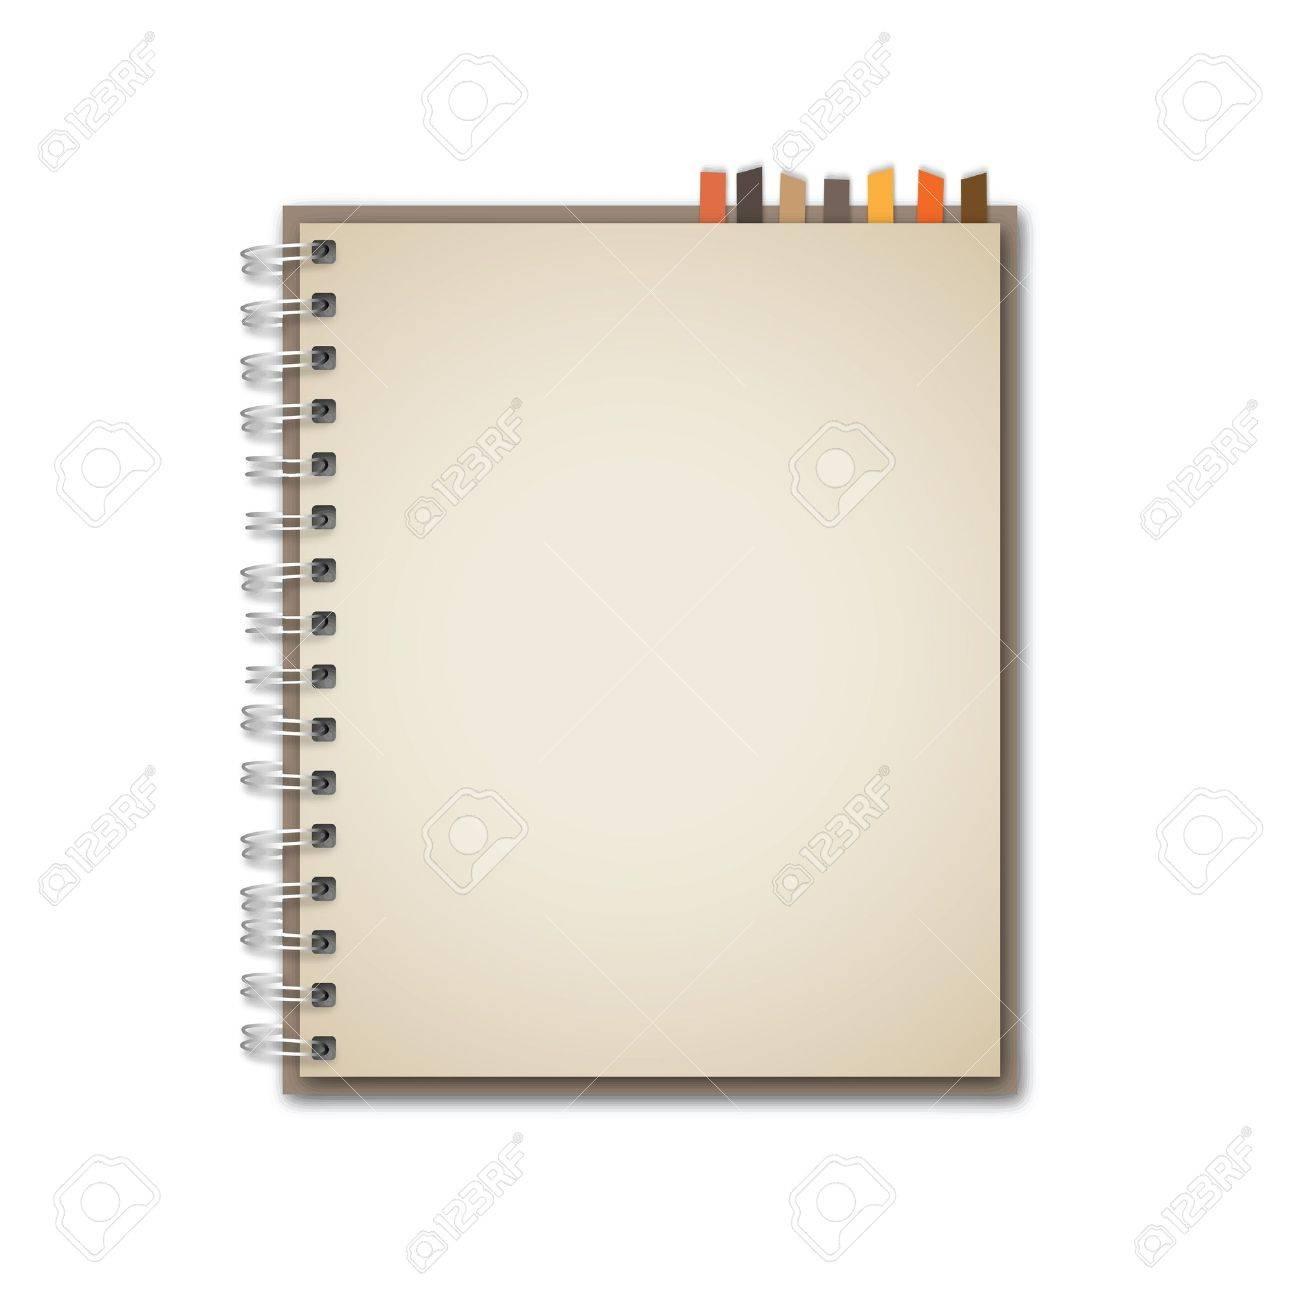 Old Brown Notebook Vector - 13551205